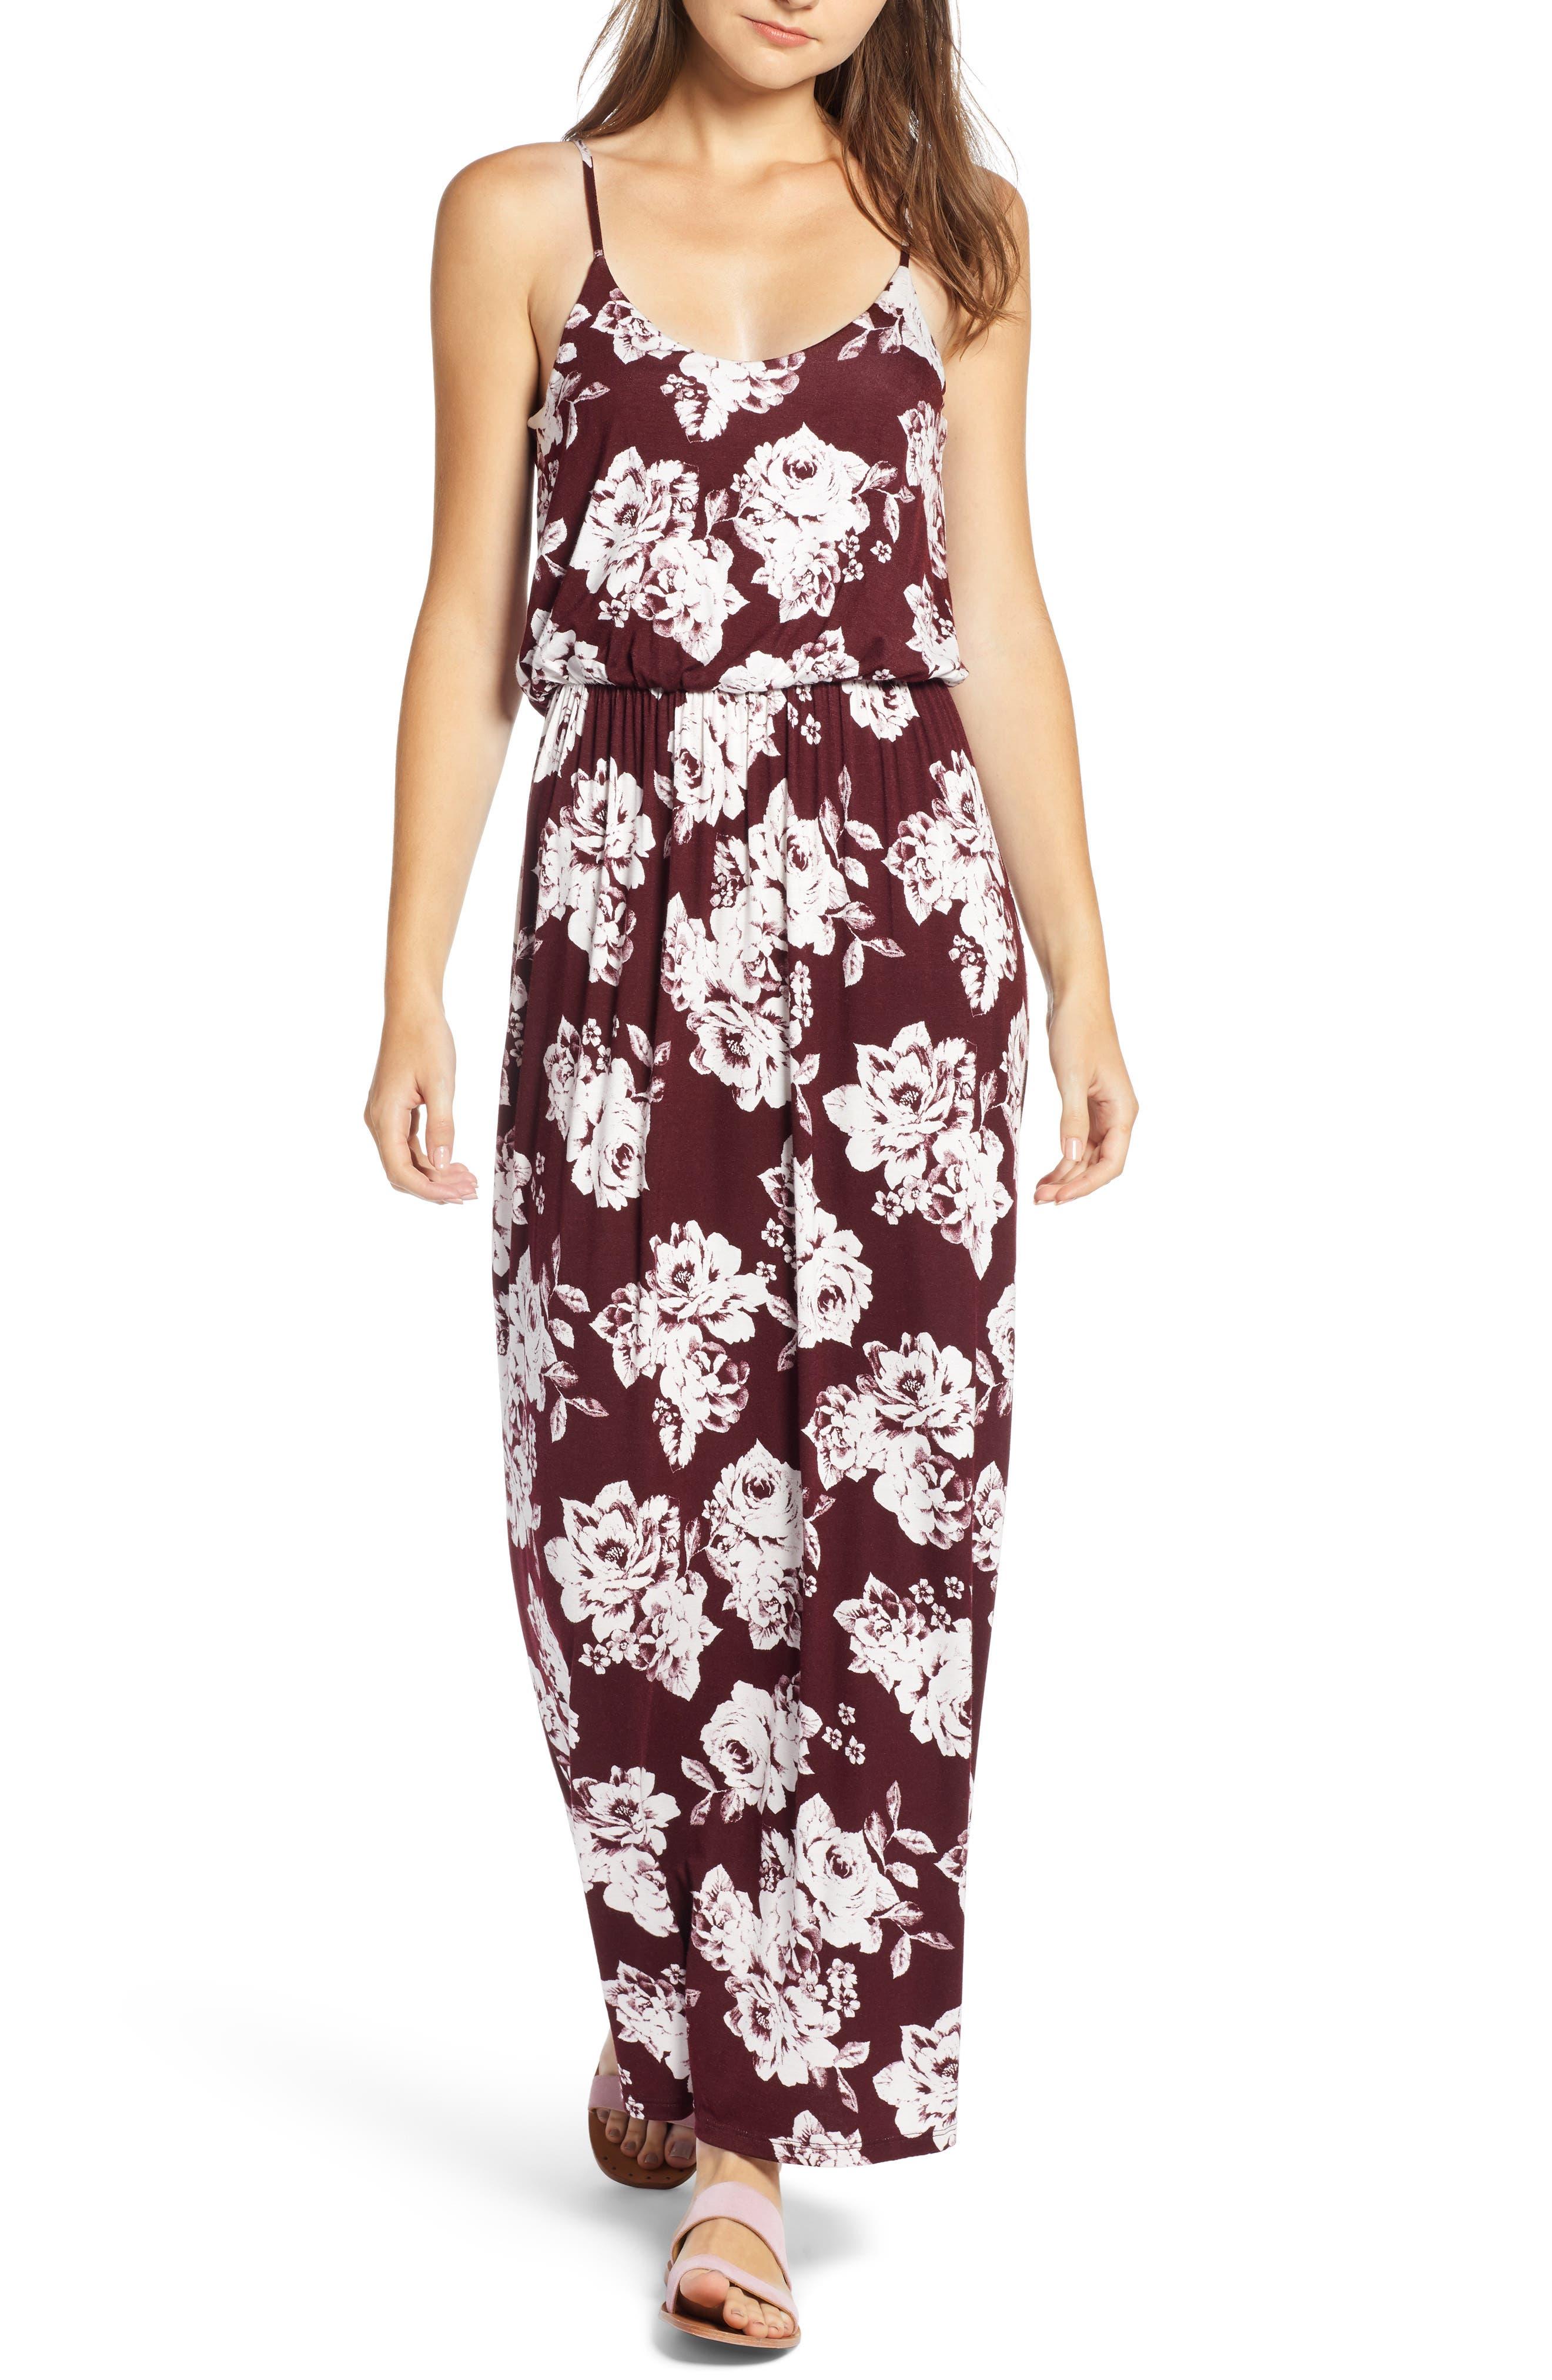 Knit Maxi Dress,                             Main thumbnail 1, color,                             BURGUNDY FLORAL